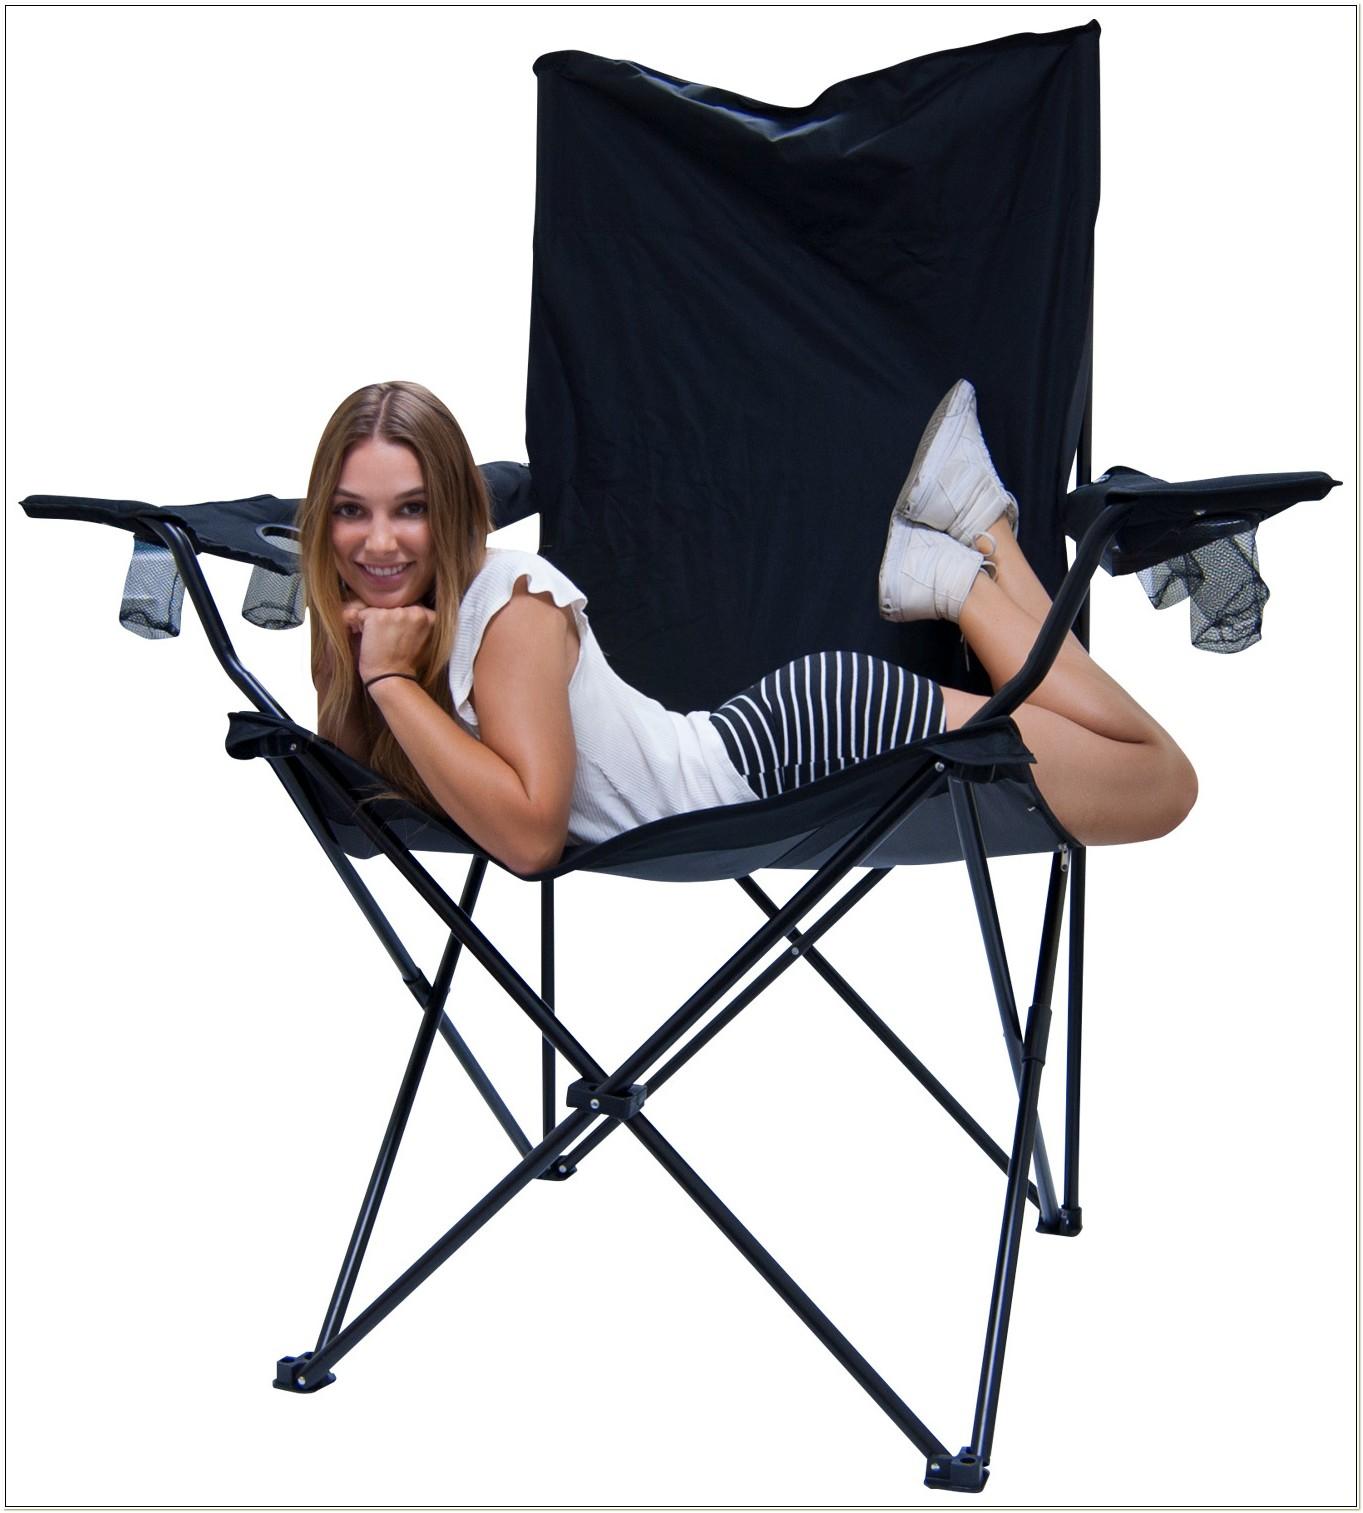 Kingpin Giant Folding Chair Black